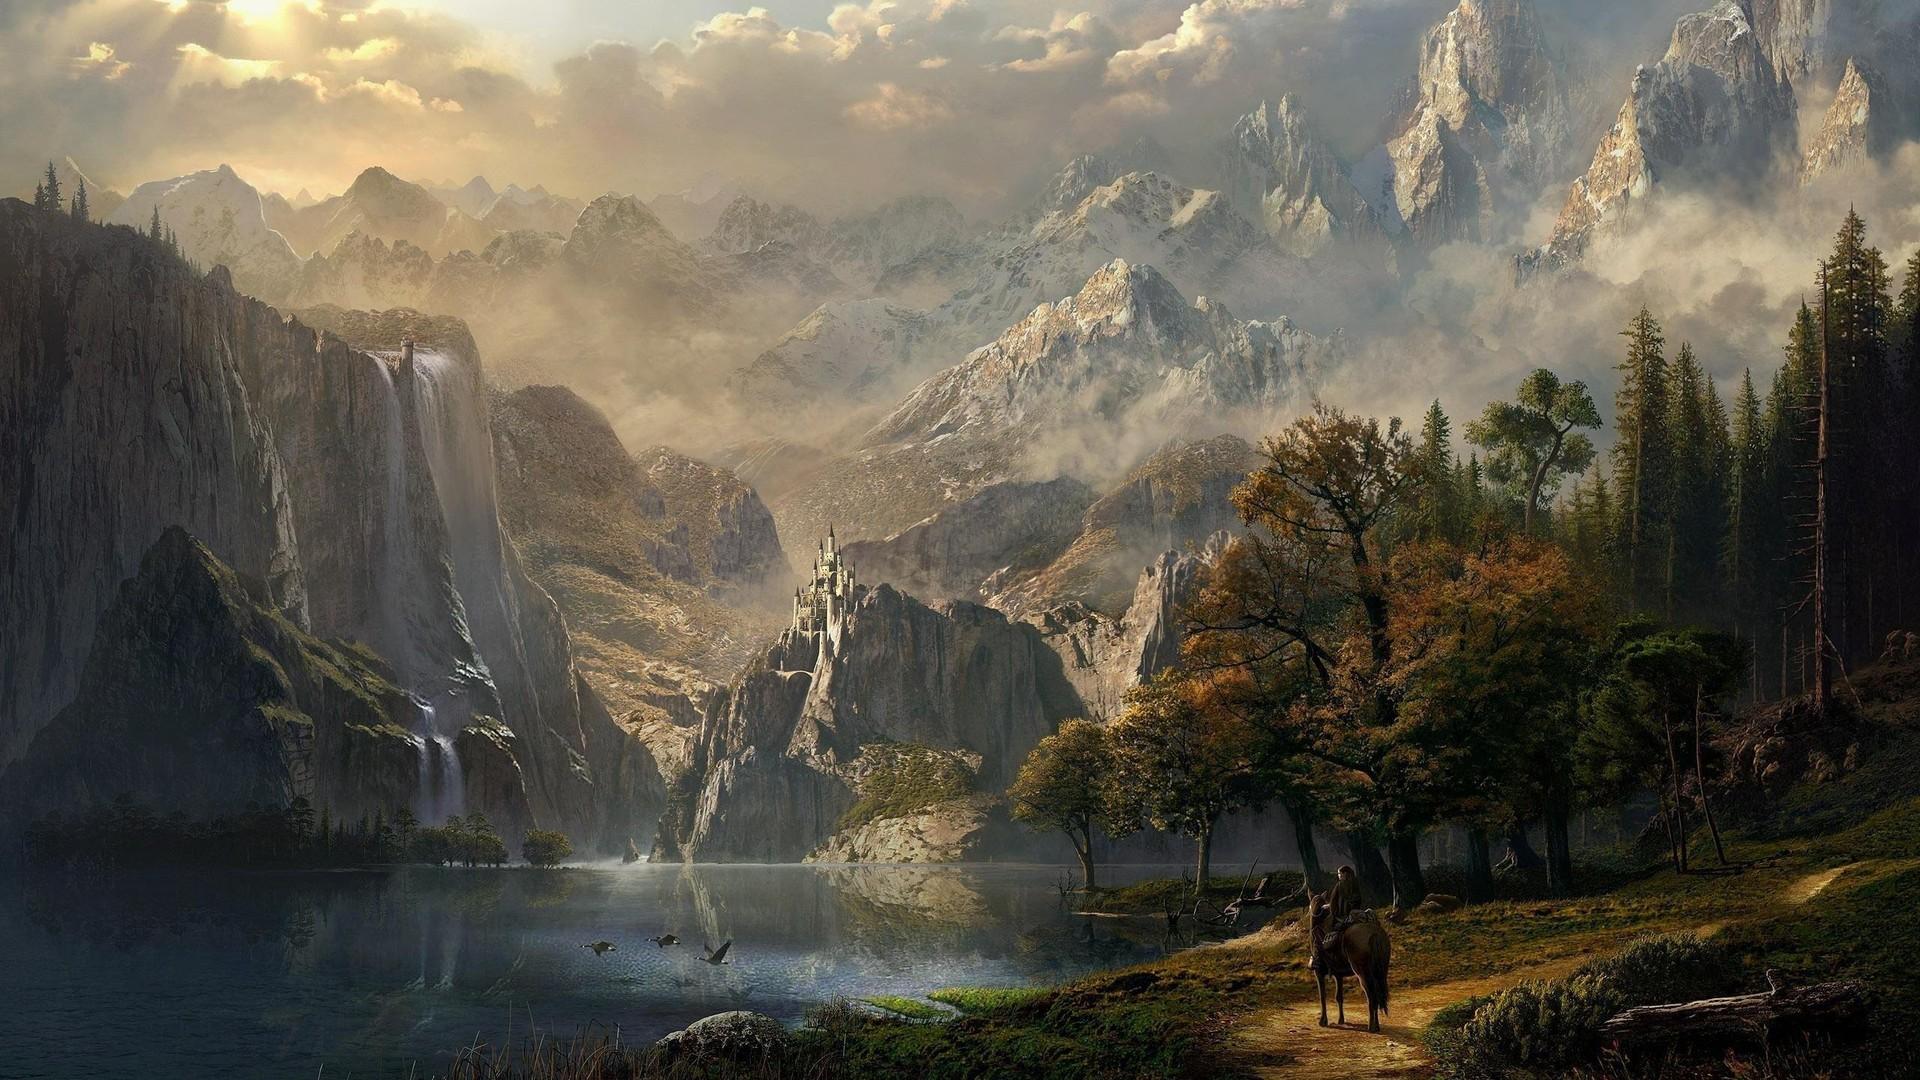 Fantasy Landscape - 1920x1080 ...